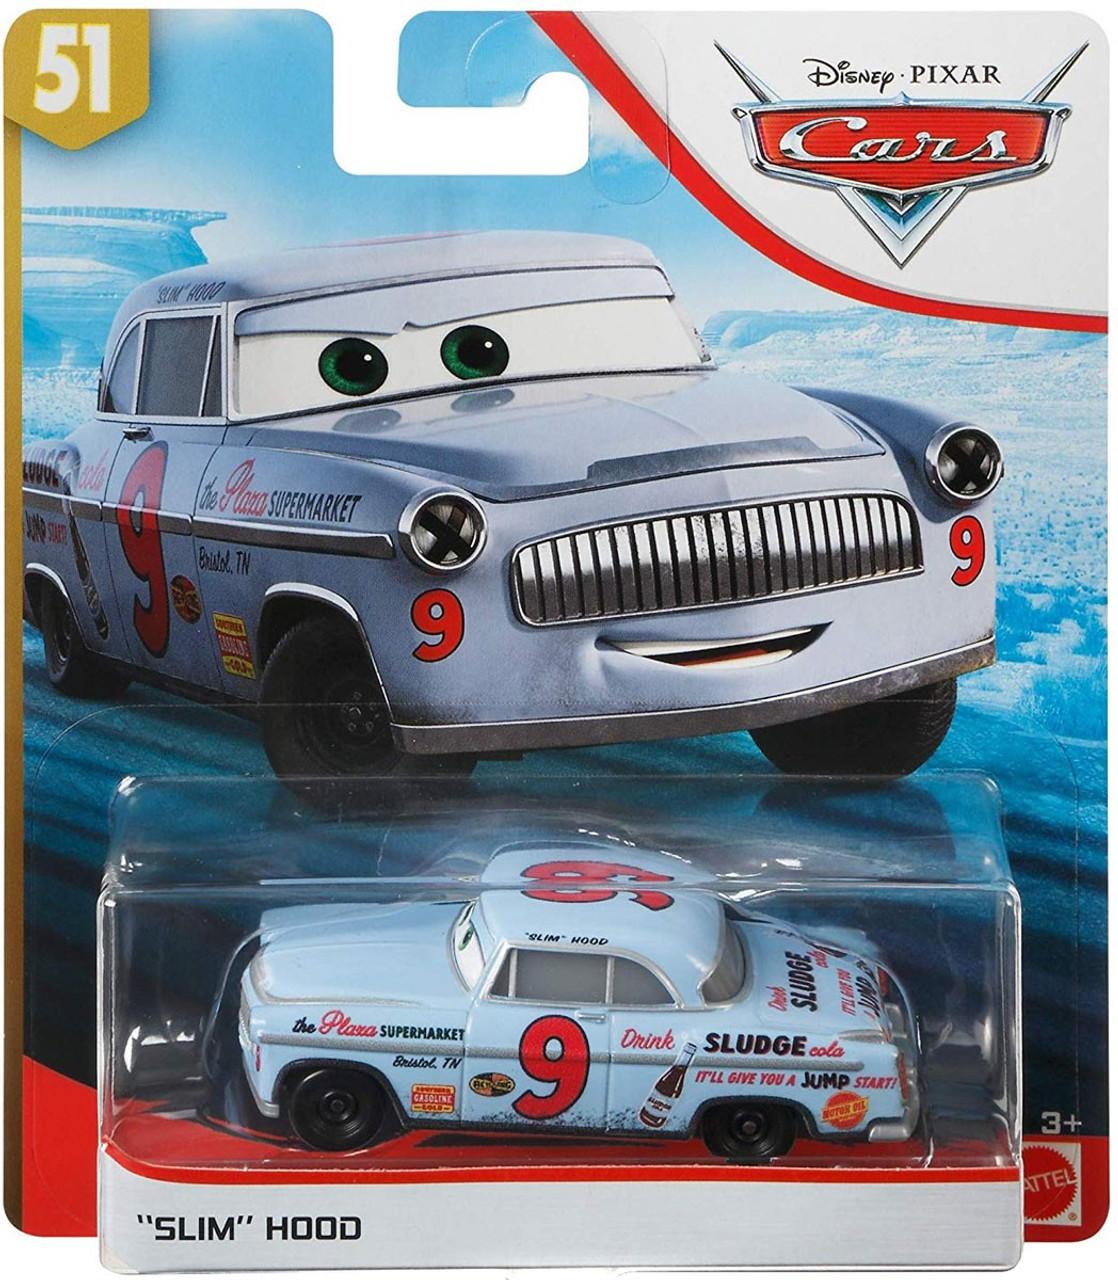 KURT CARS 3 Mattel Disney Pixar